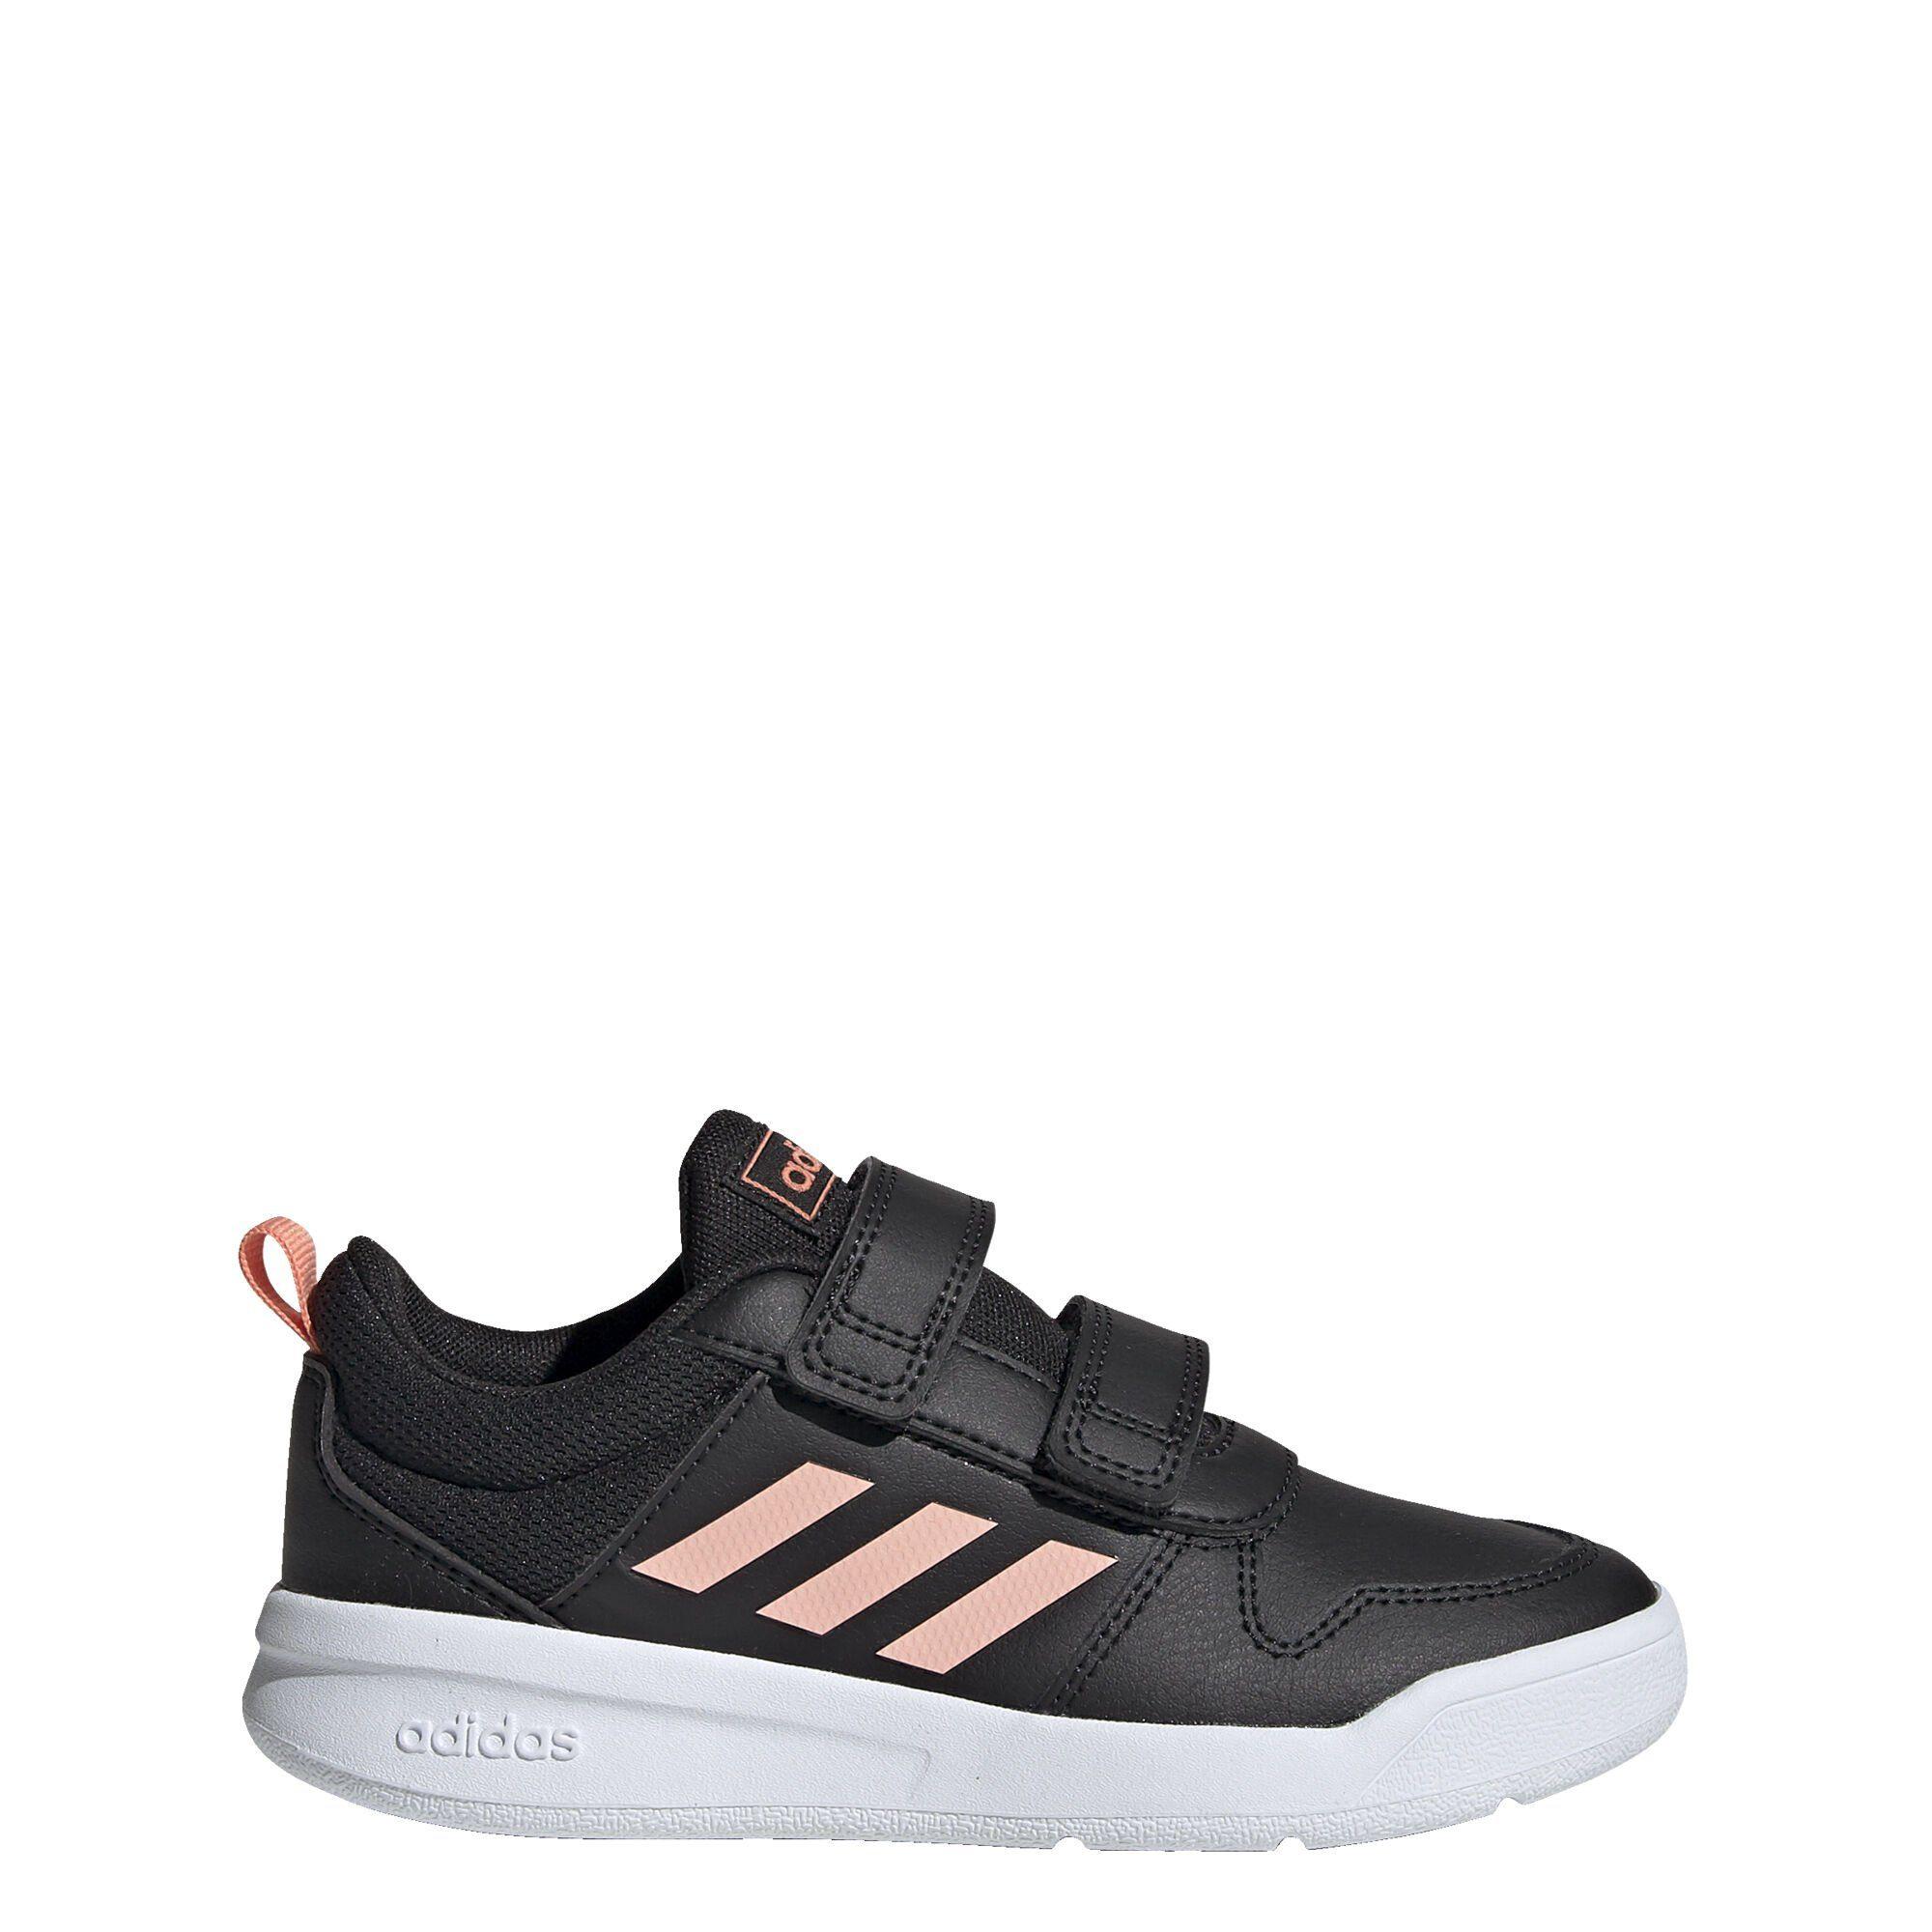 adidas Performance »Tensaurus Shoes« Trainingsschuh Duramo online kaufen | OTTO